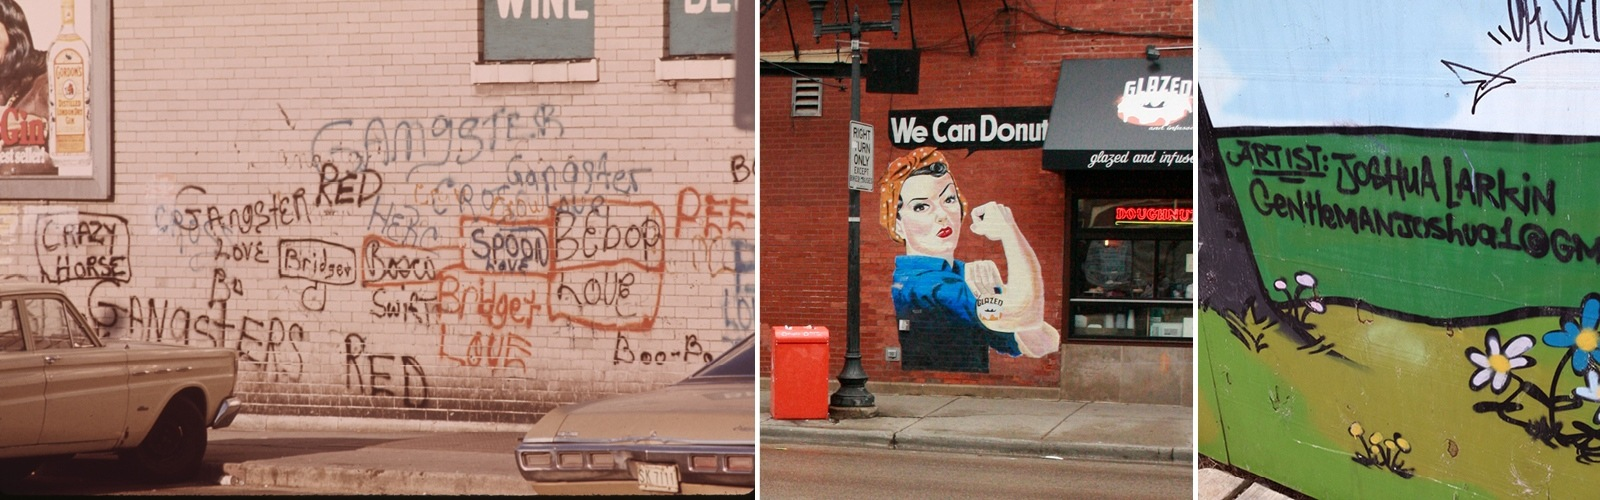 Chicago street art history